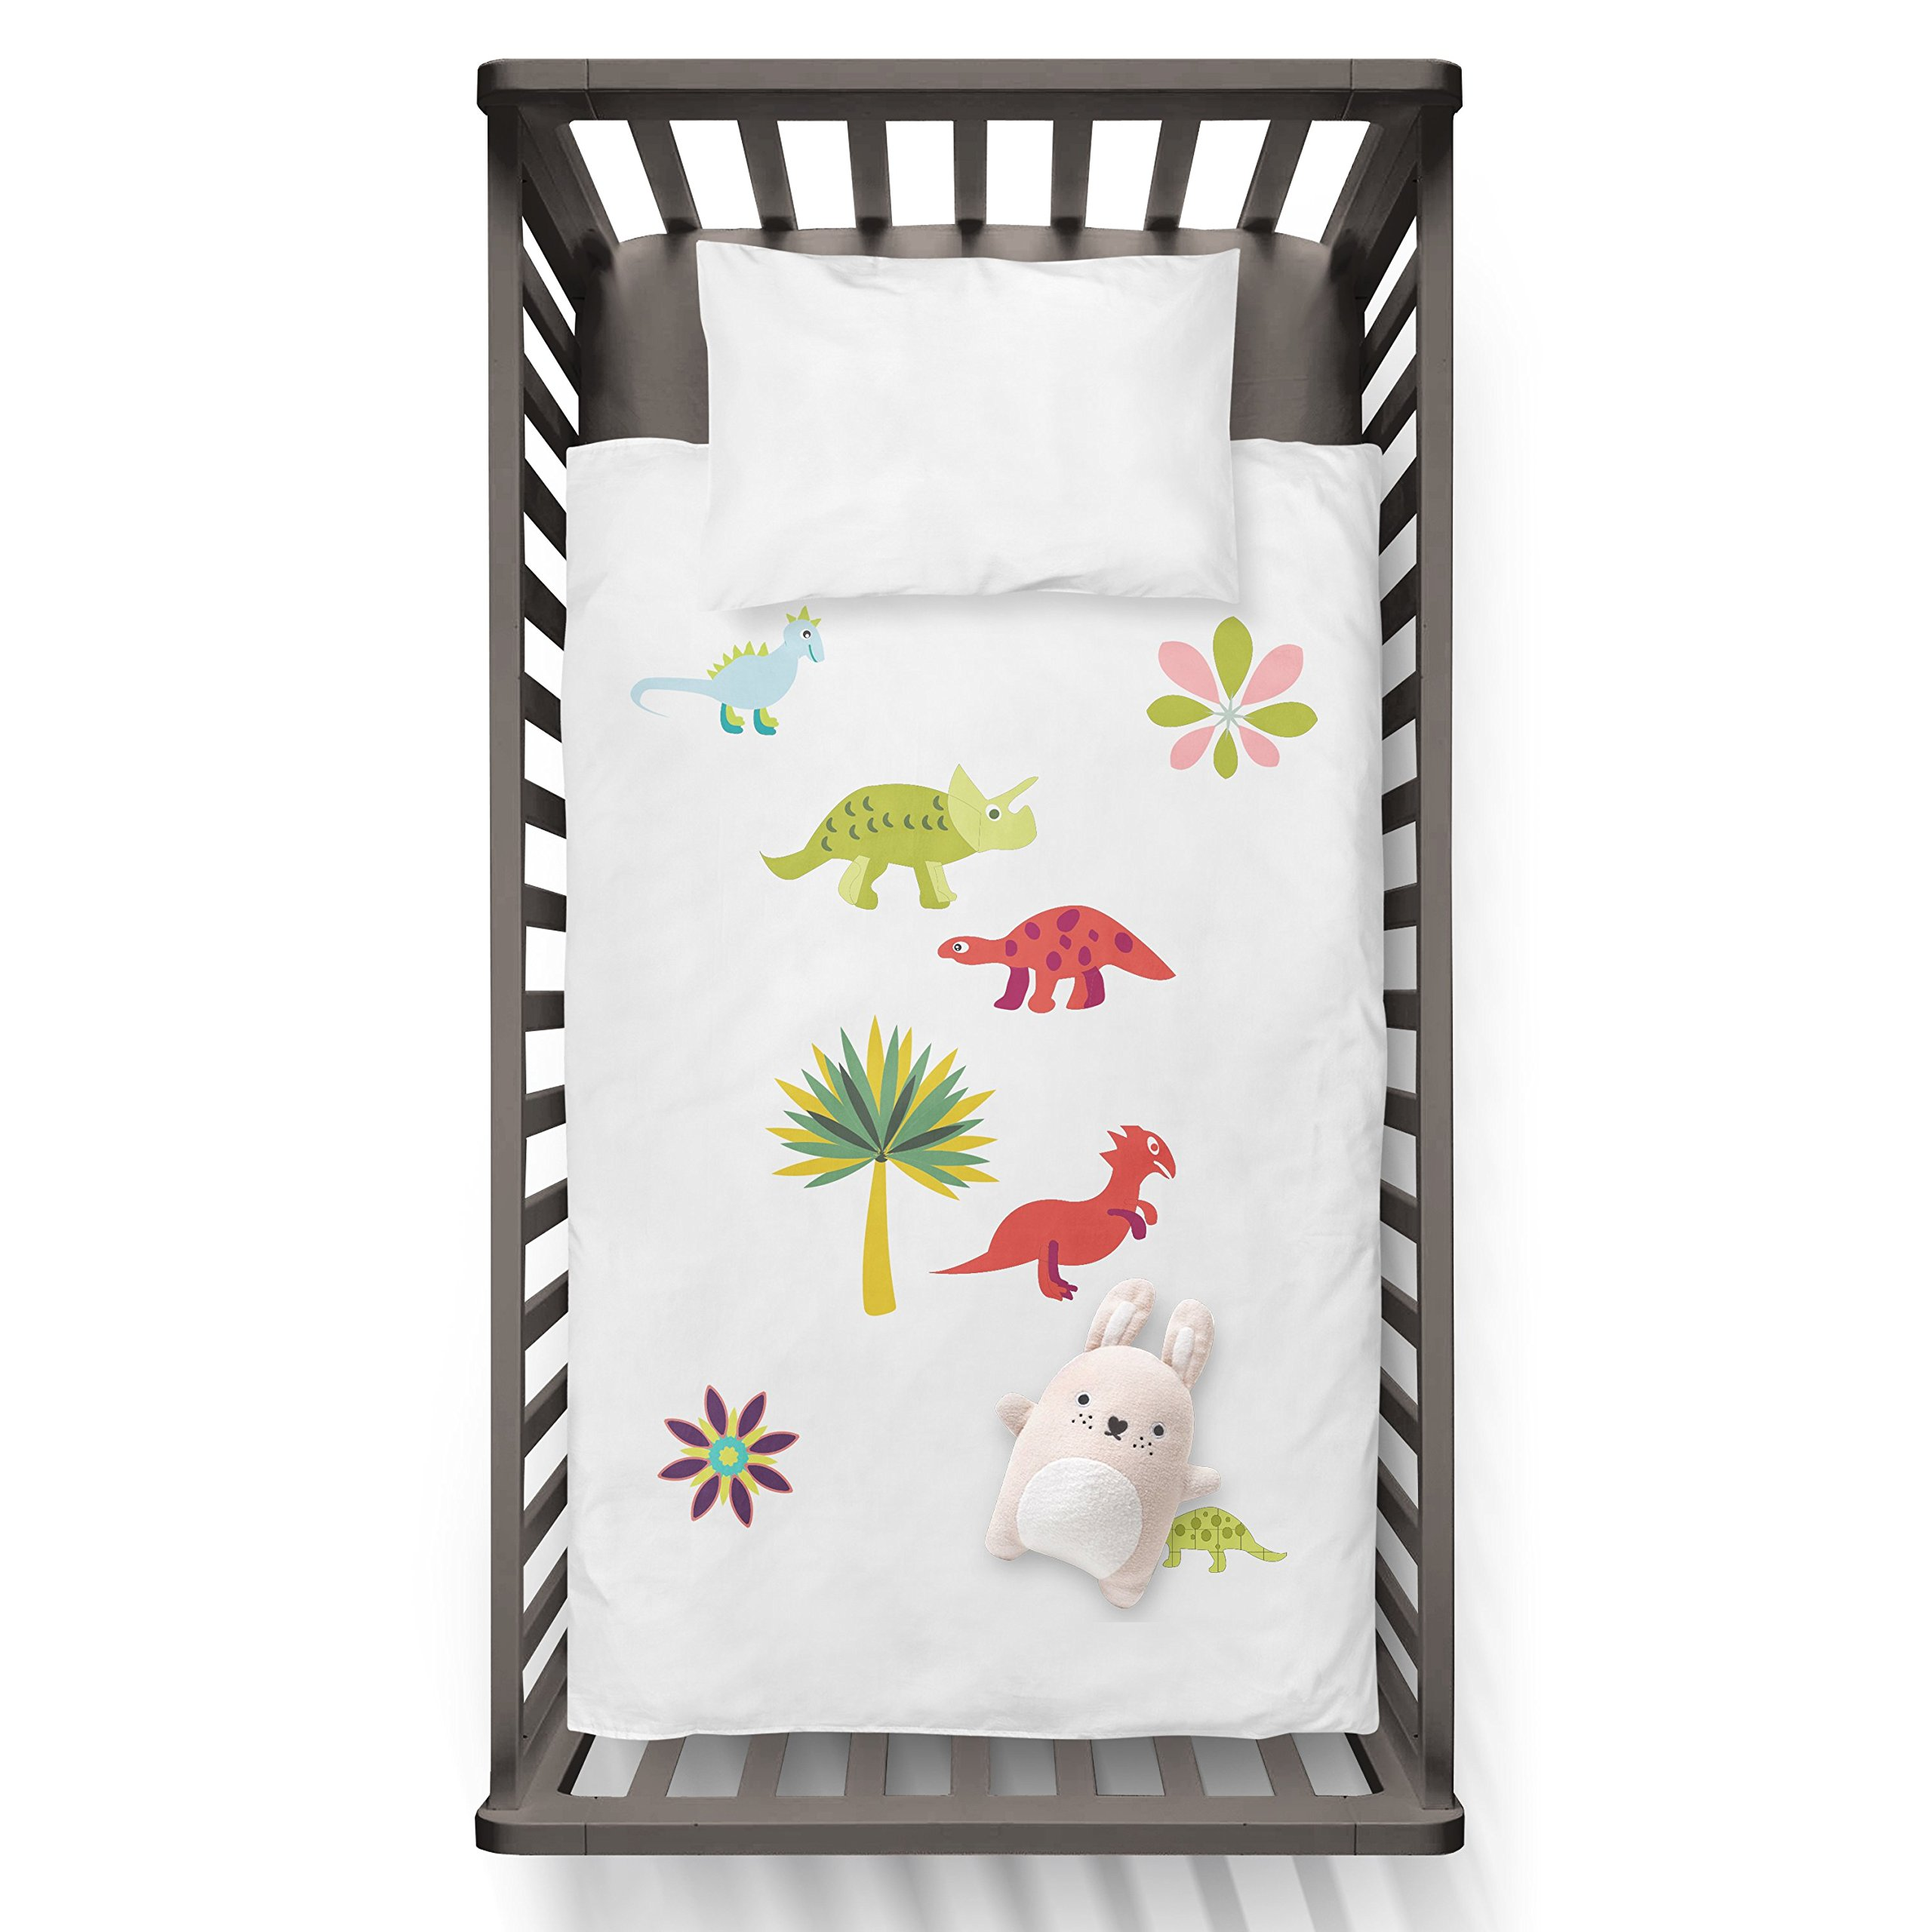 Baby Dino Duvet Funny Humor Hip Baby Duvet /Pillow set,Toddler Duvet,Oeko-Tex,Personalized duvet and pillow,Oraganic,gift